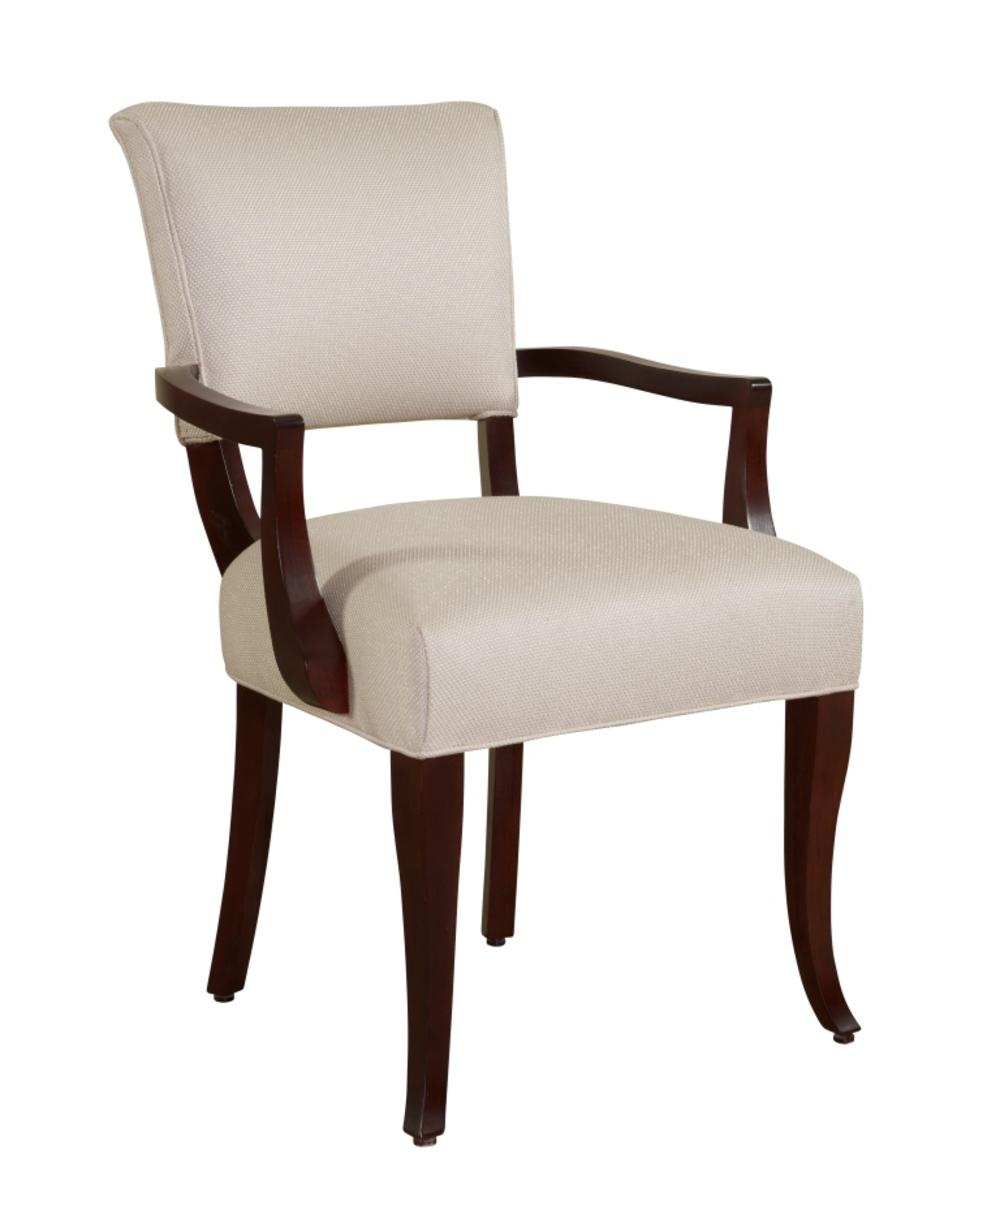 Designmaster Furniture - Donora Arm Chair